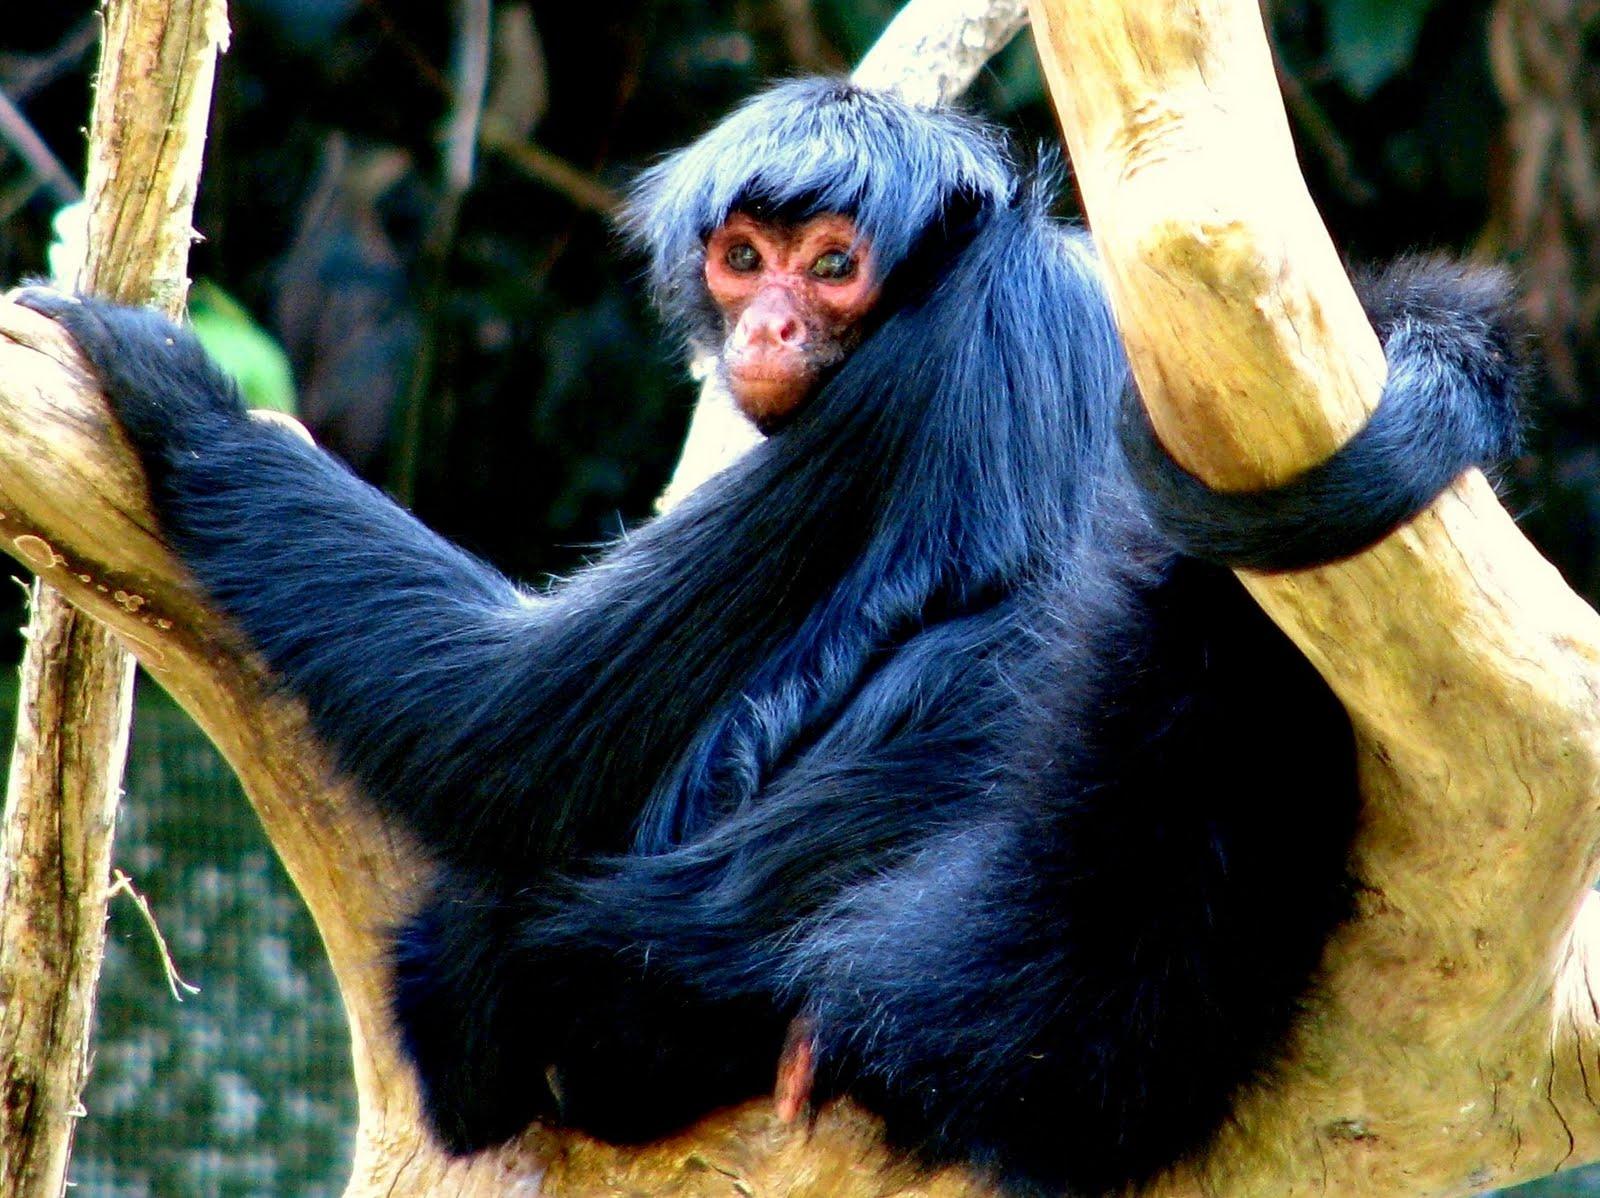 http://eyesoncolombia.files.wordpress.com/2010/06/ateles_paniscus_-brazil-8.jpg